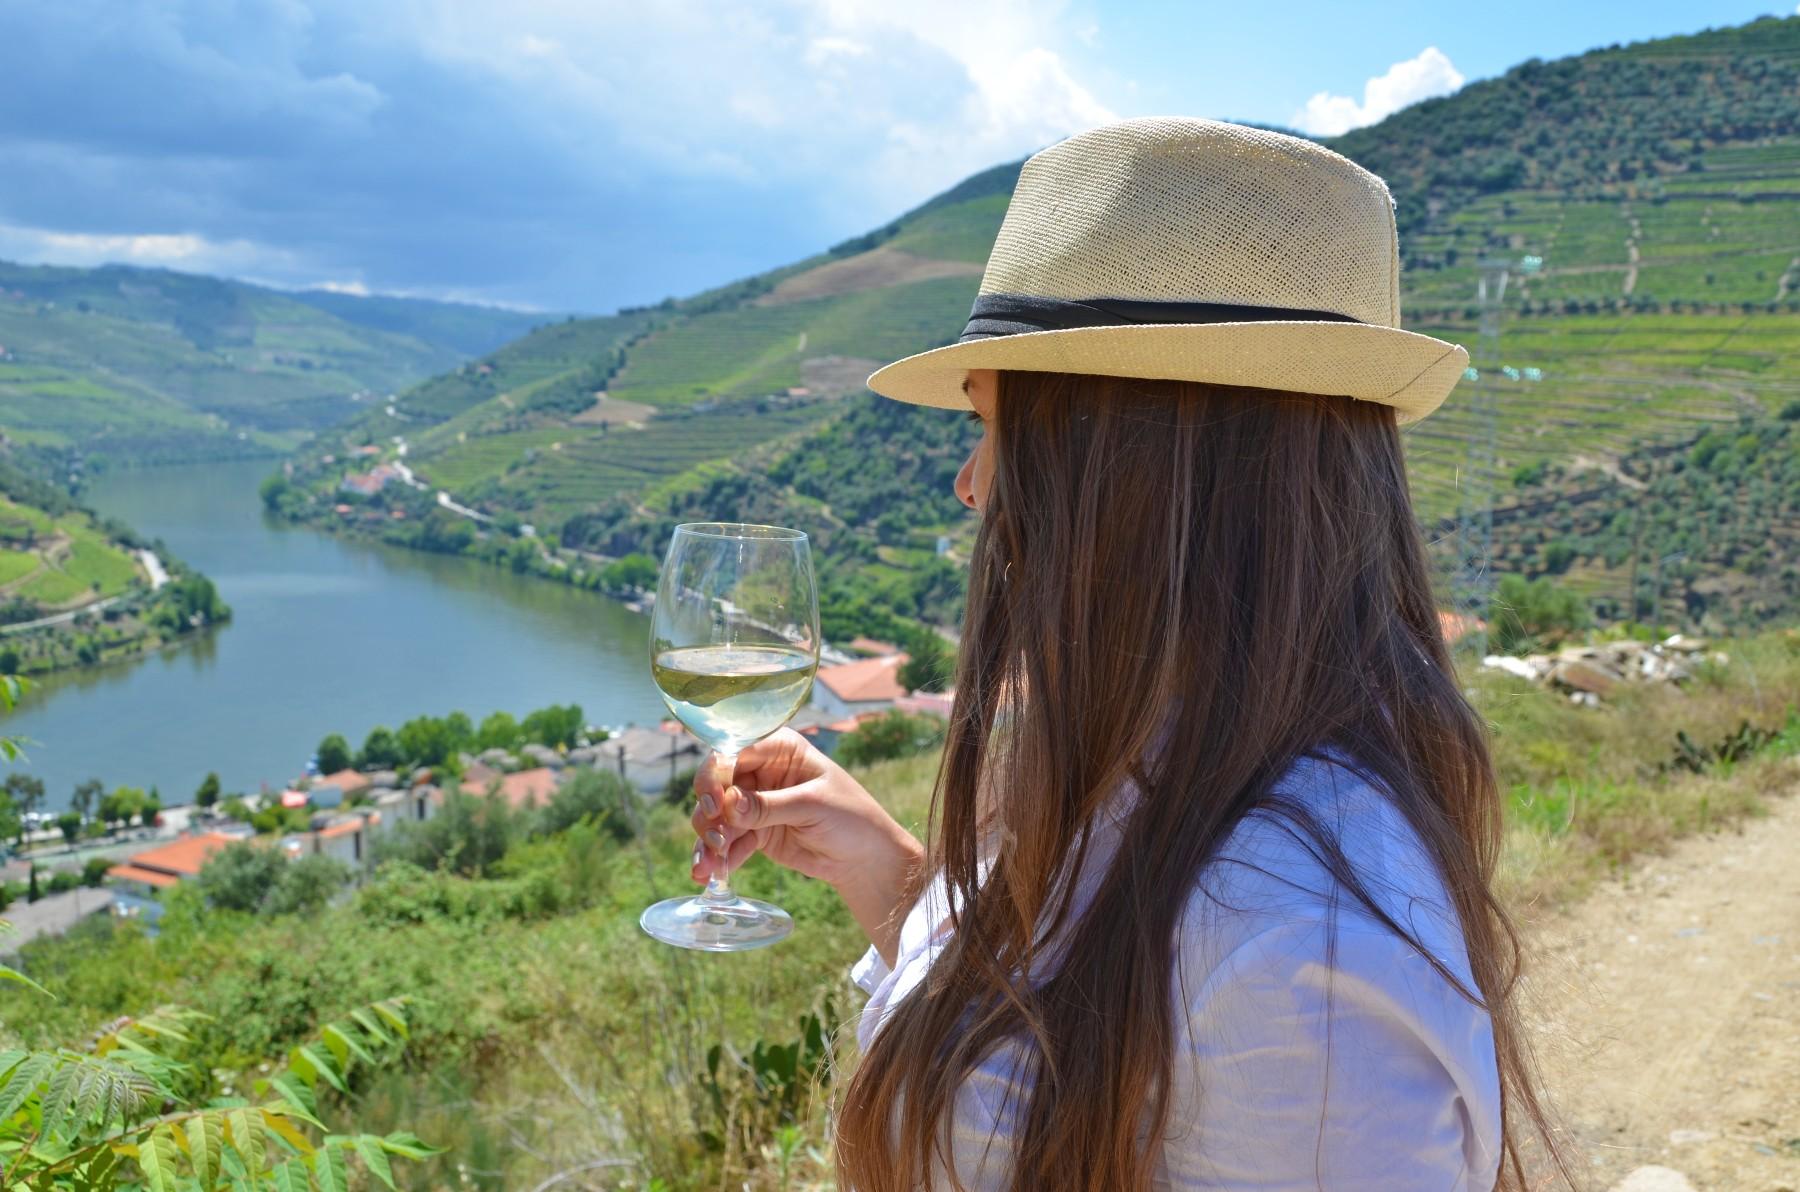 portuguese cuisine, Portugal wine vineyard